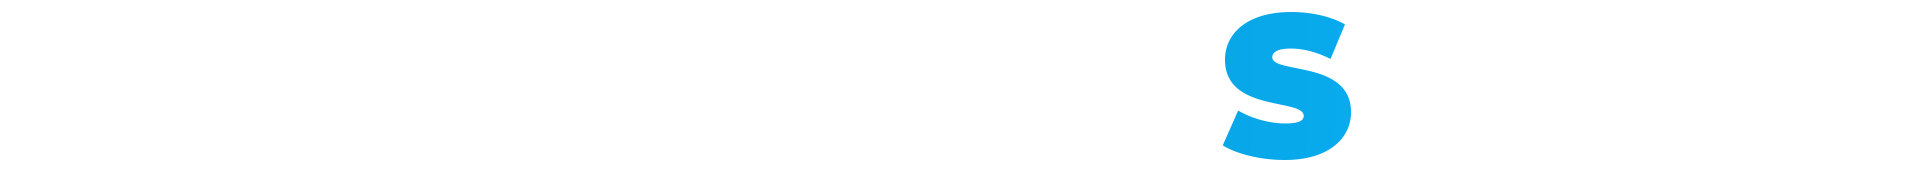 bfs-slogan8